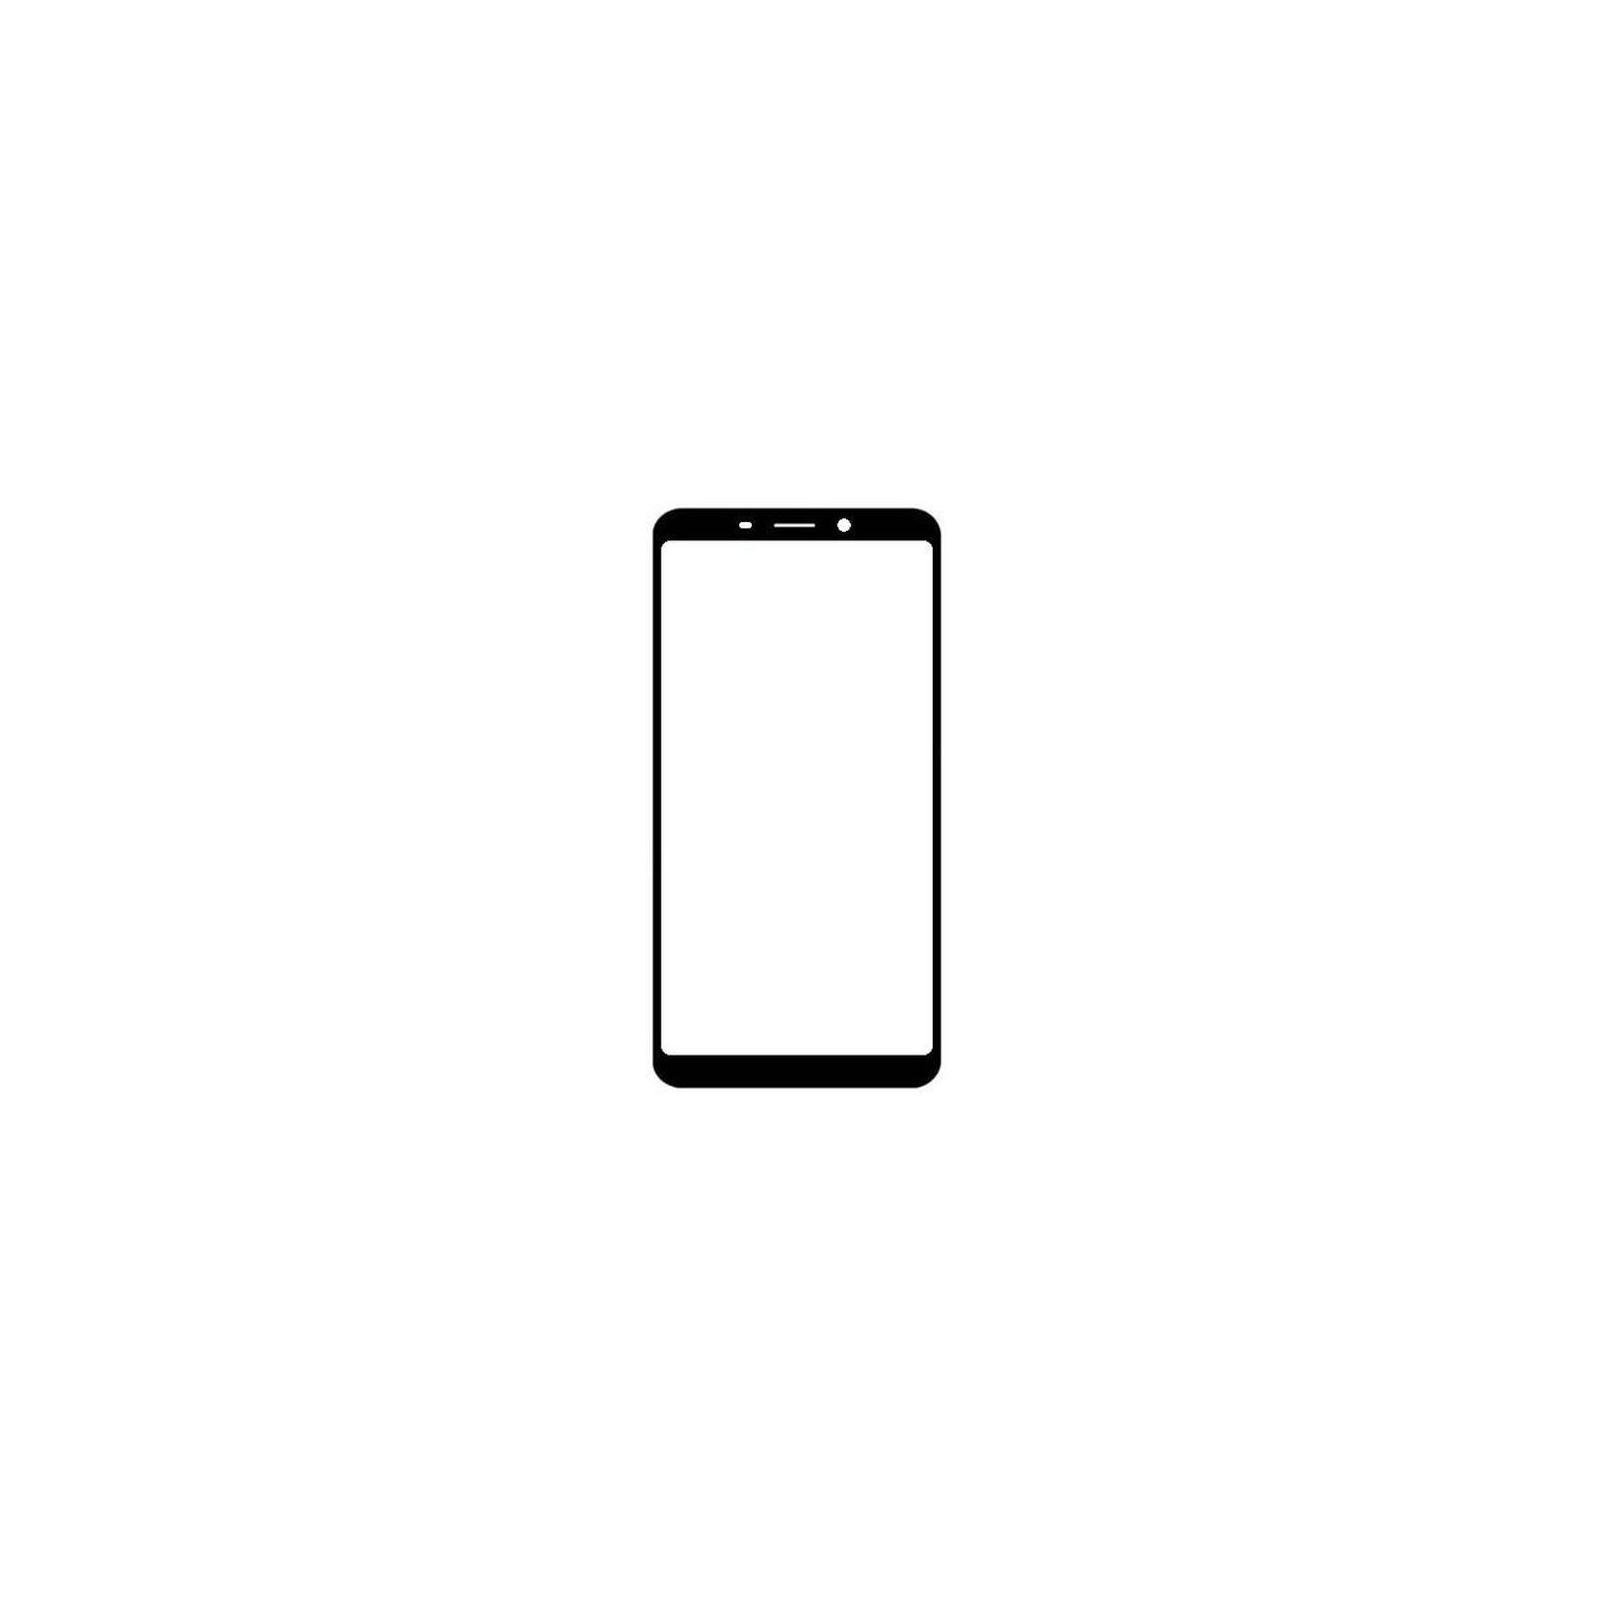 Стекло защитное Drobak для Huawei P20 Lite Black Full screen (448414) изображение 2